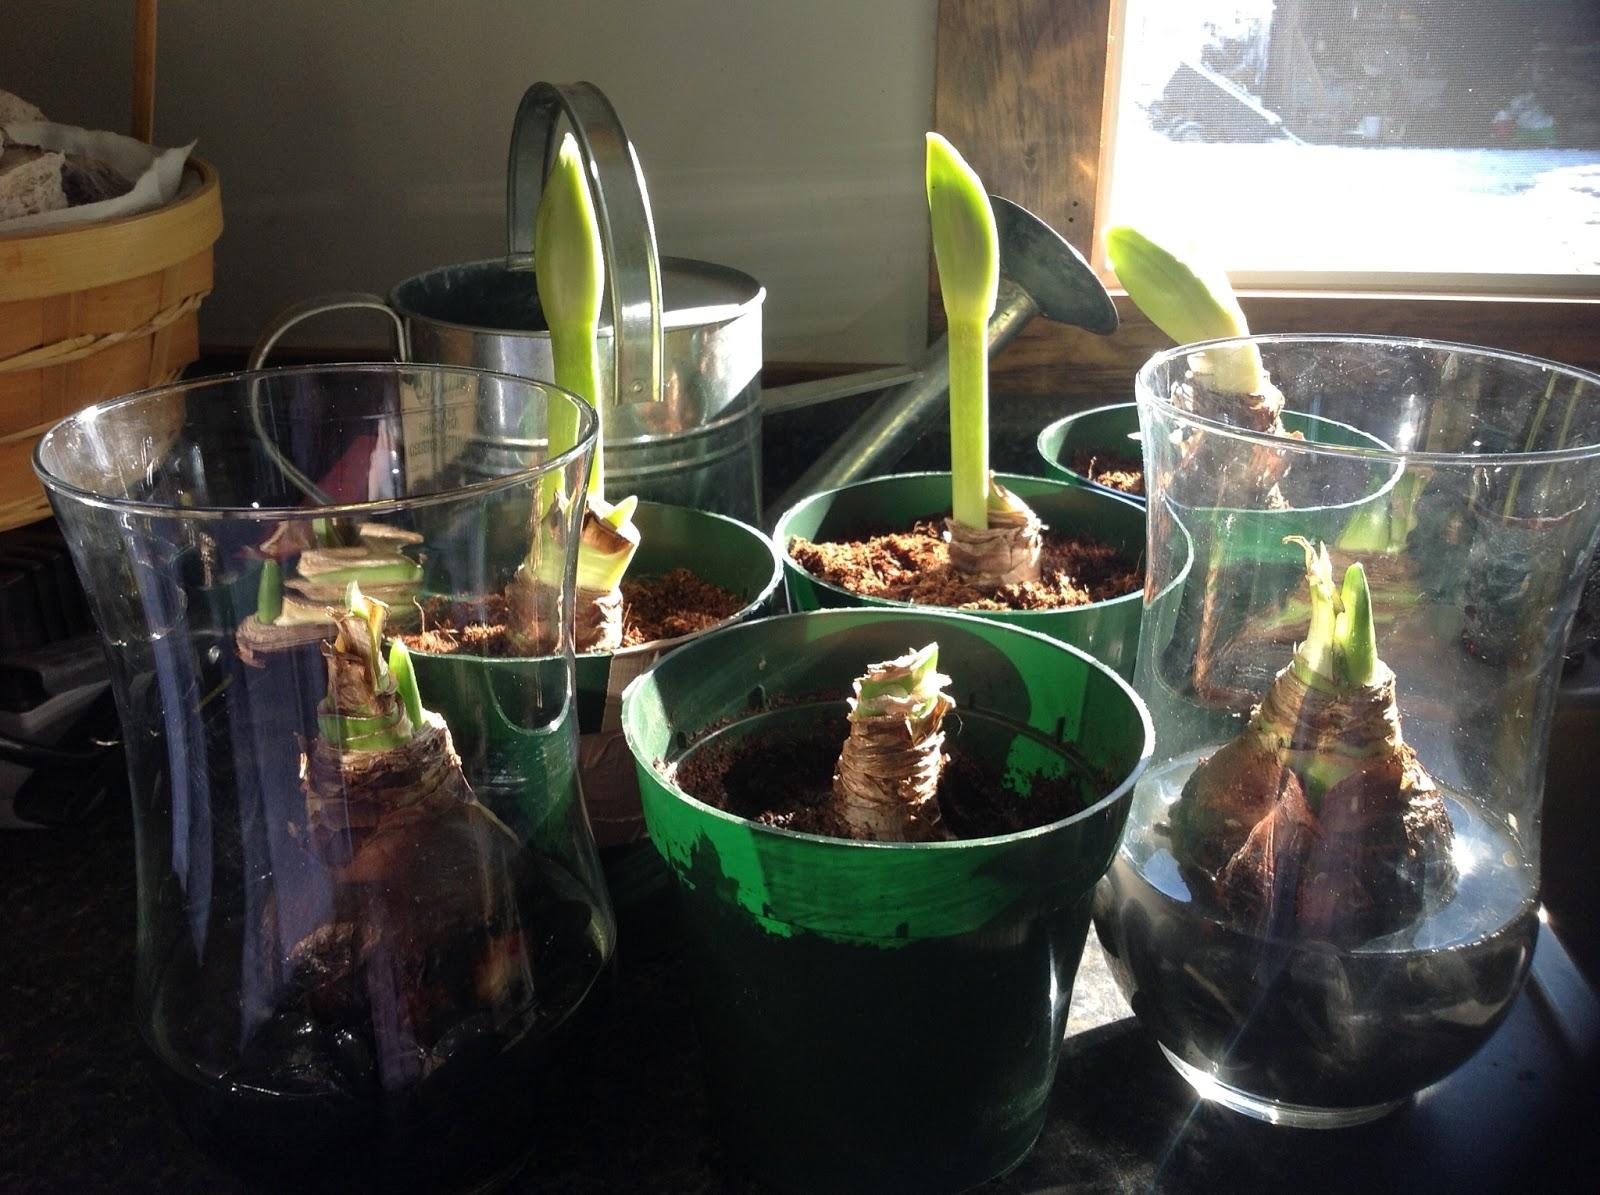 deborah hamiltons amaryllis bulbs